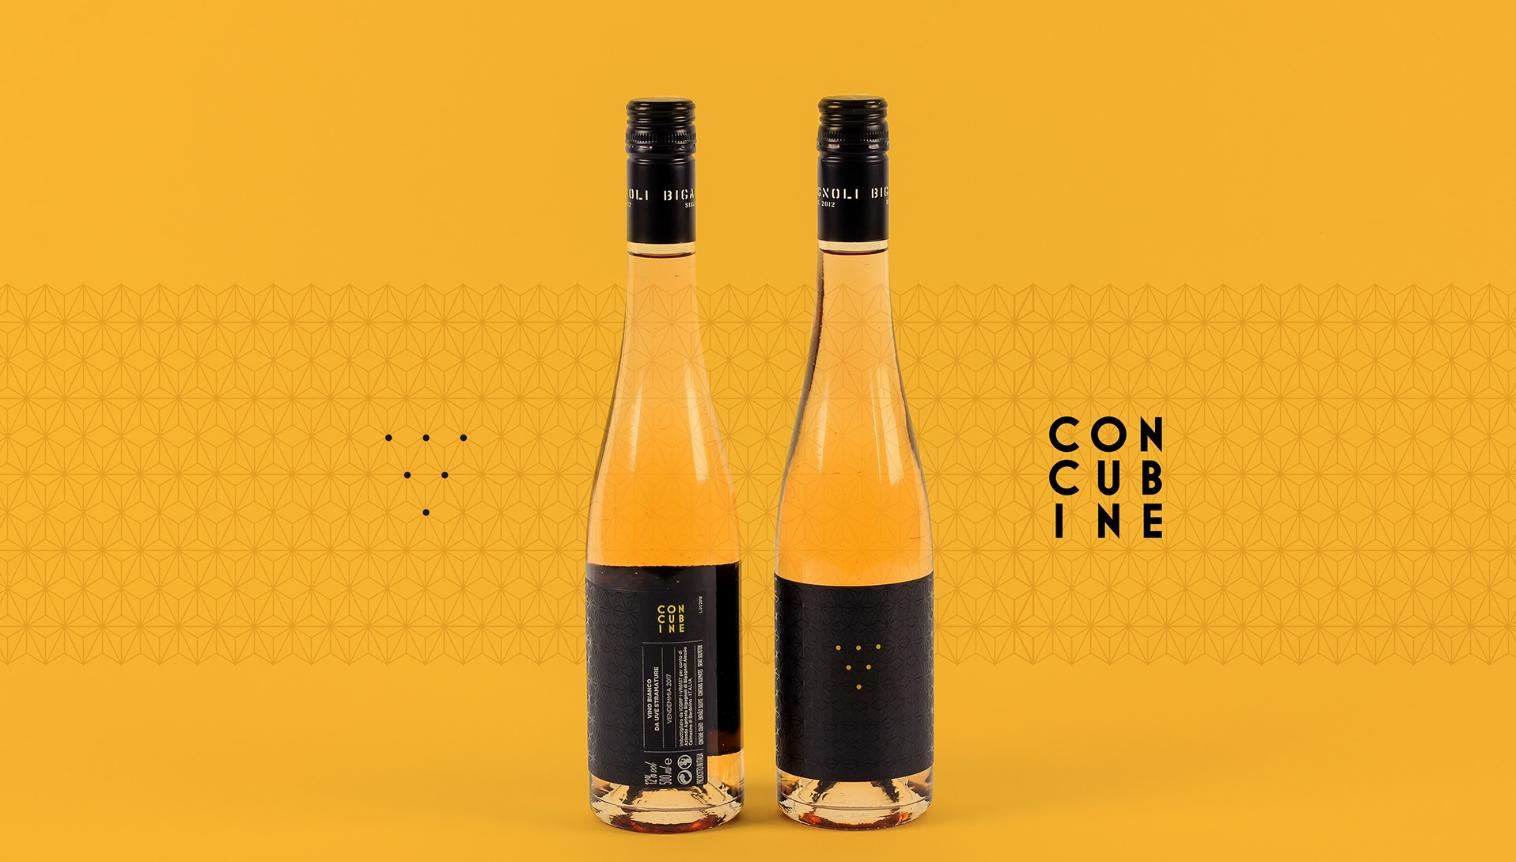 Concubine vino bianco da uve stramature